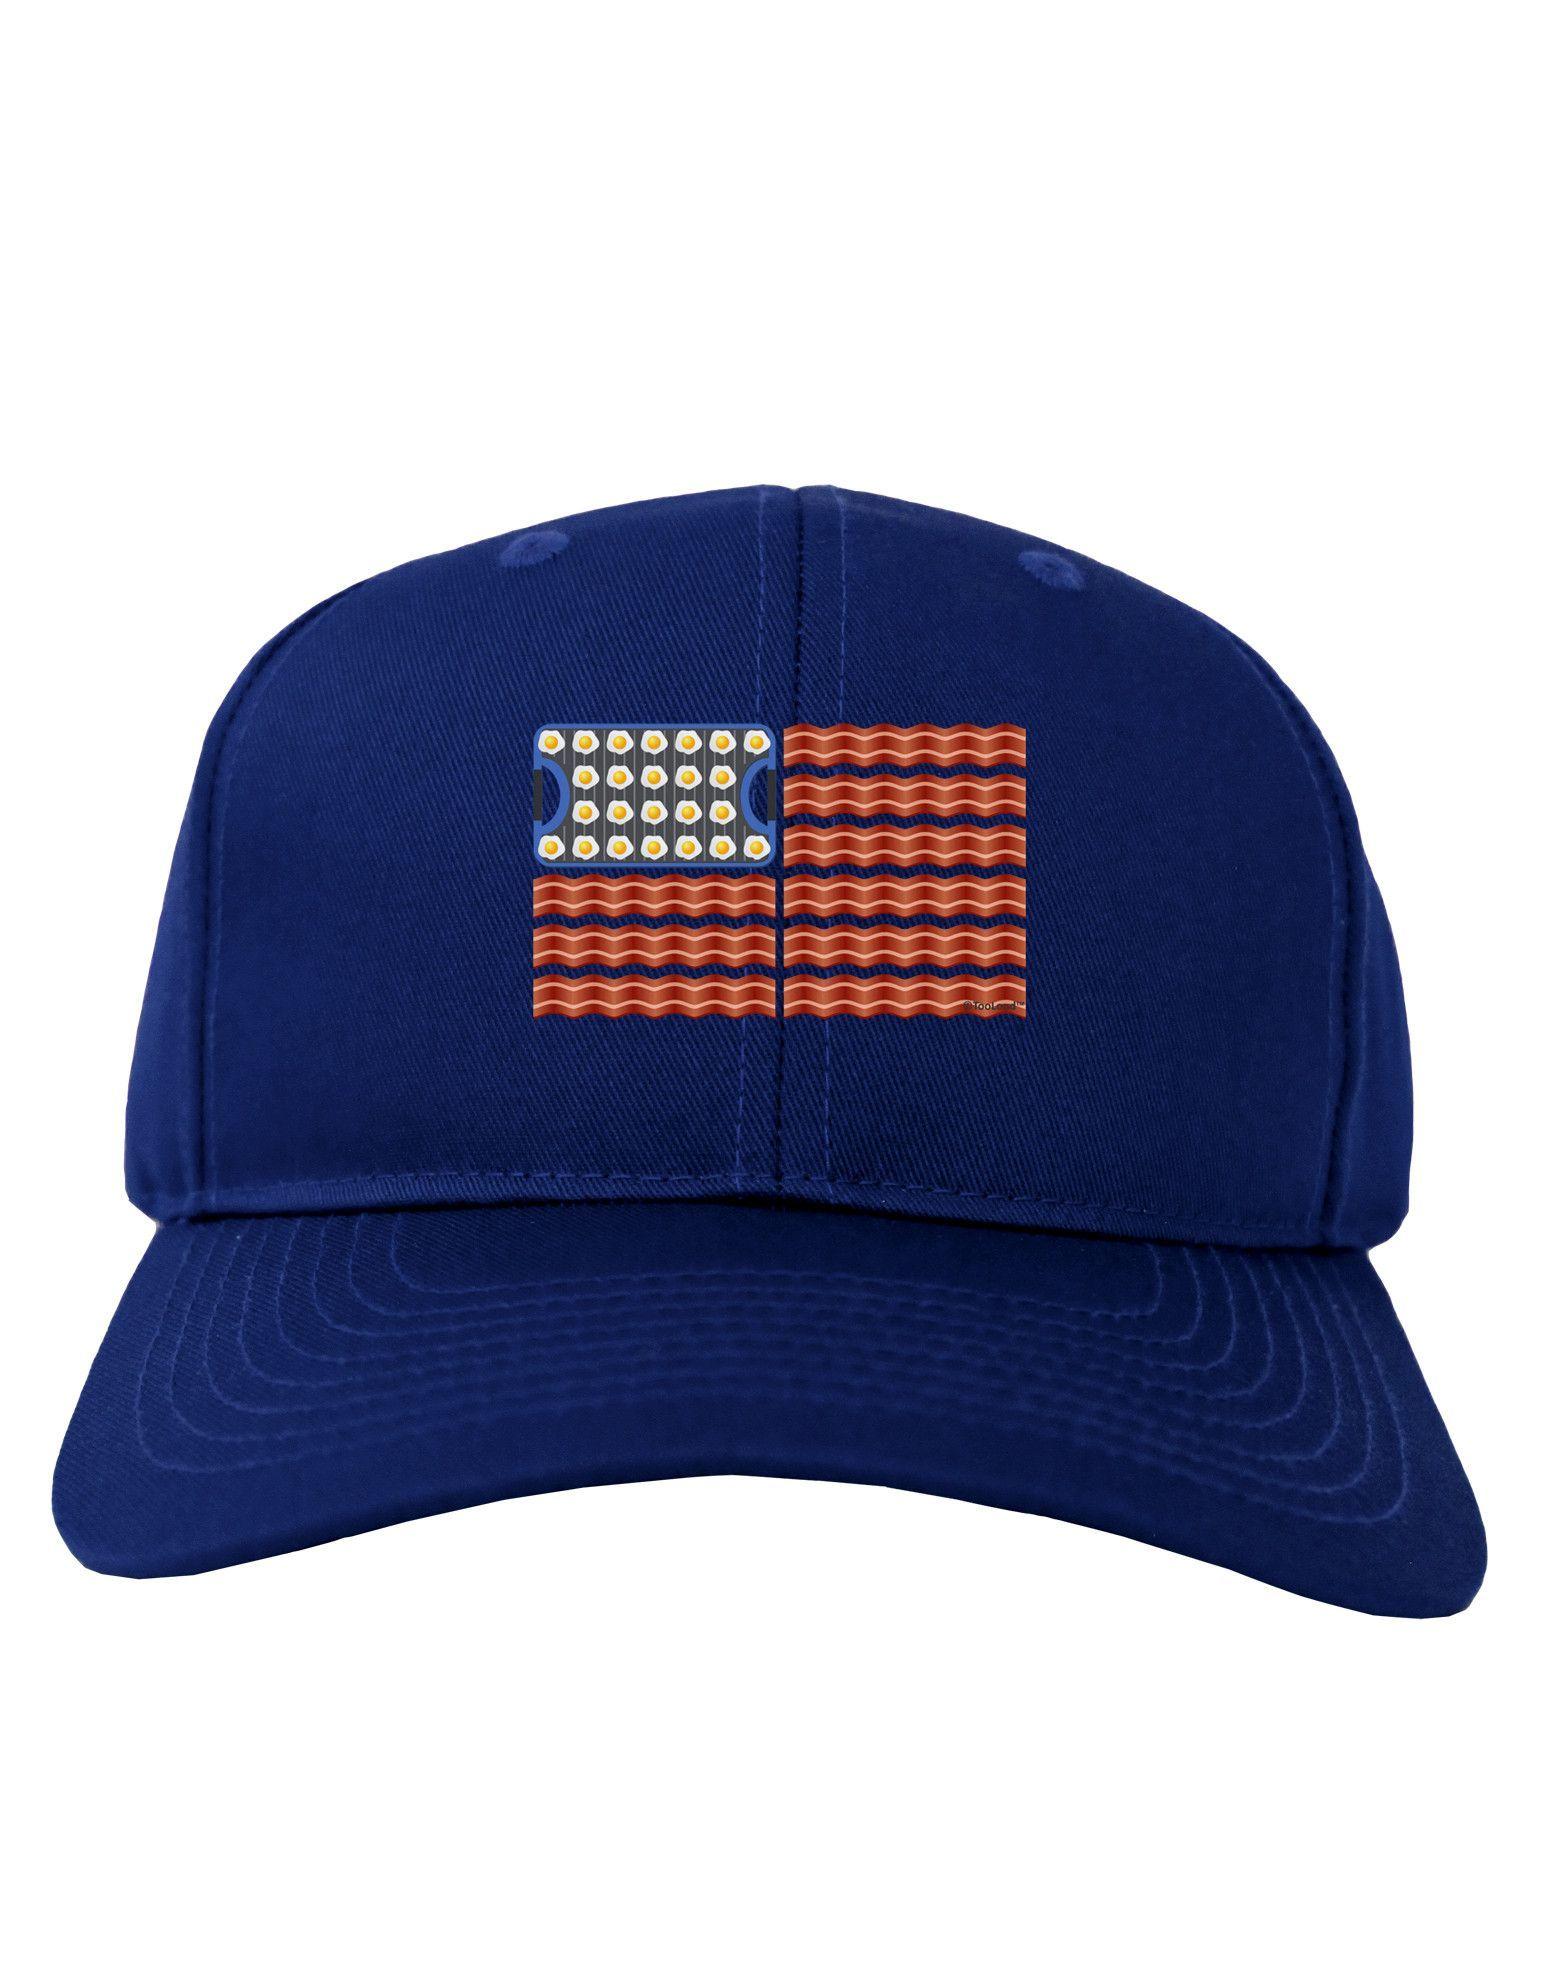 TooLoud American Breakfast Flag - Bacon and Eggs Adult Dark Baseball Cap Hat